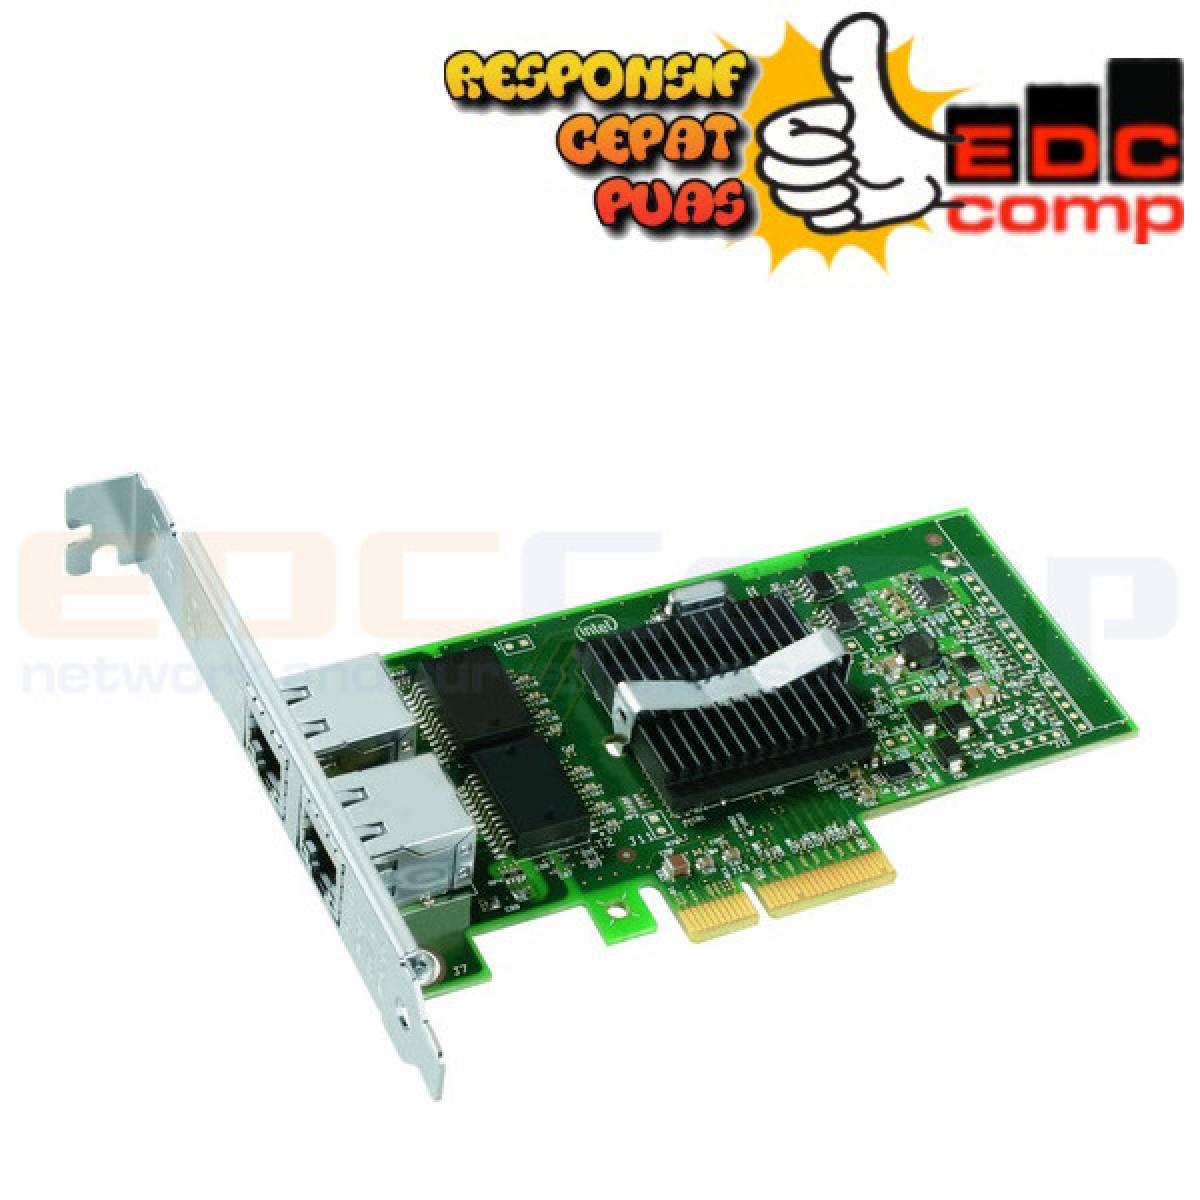 Intel Pro 1000 PT Dual Port - NIC - Server Adapter - EdcComp